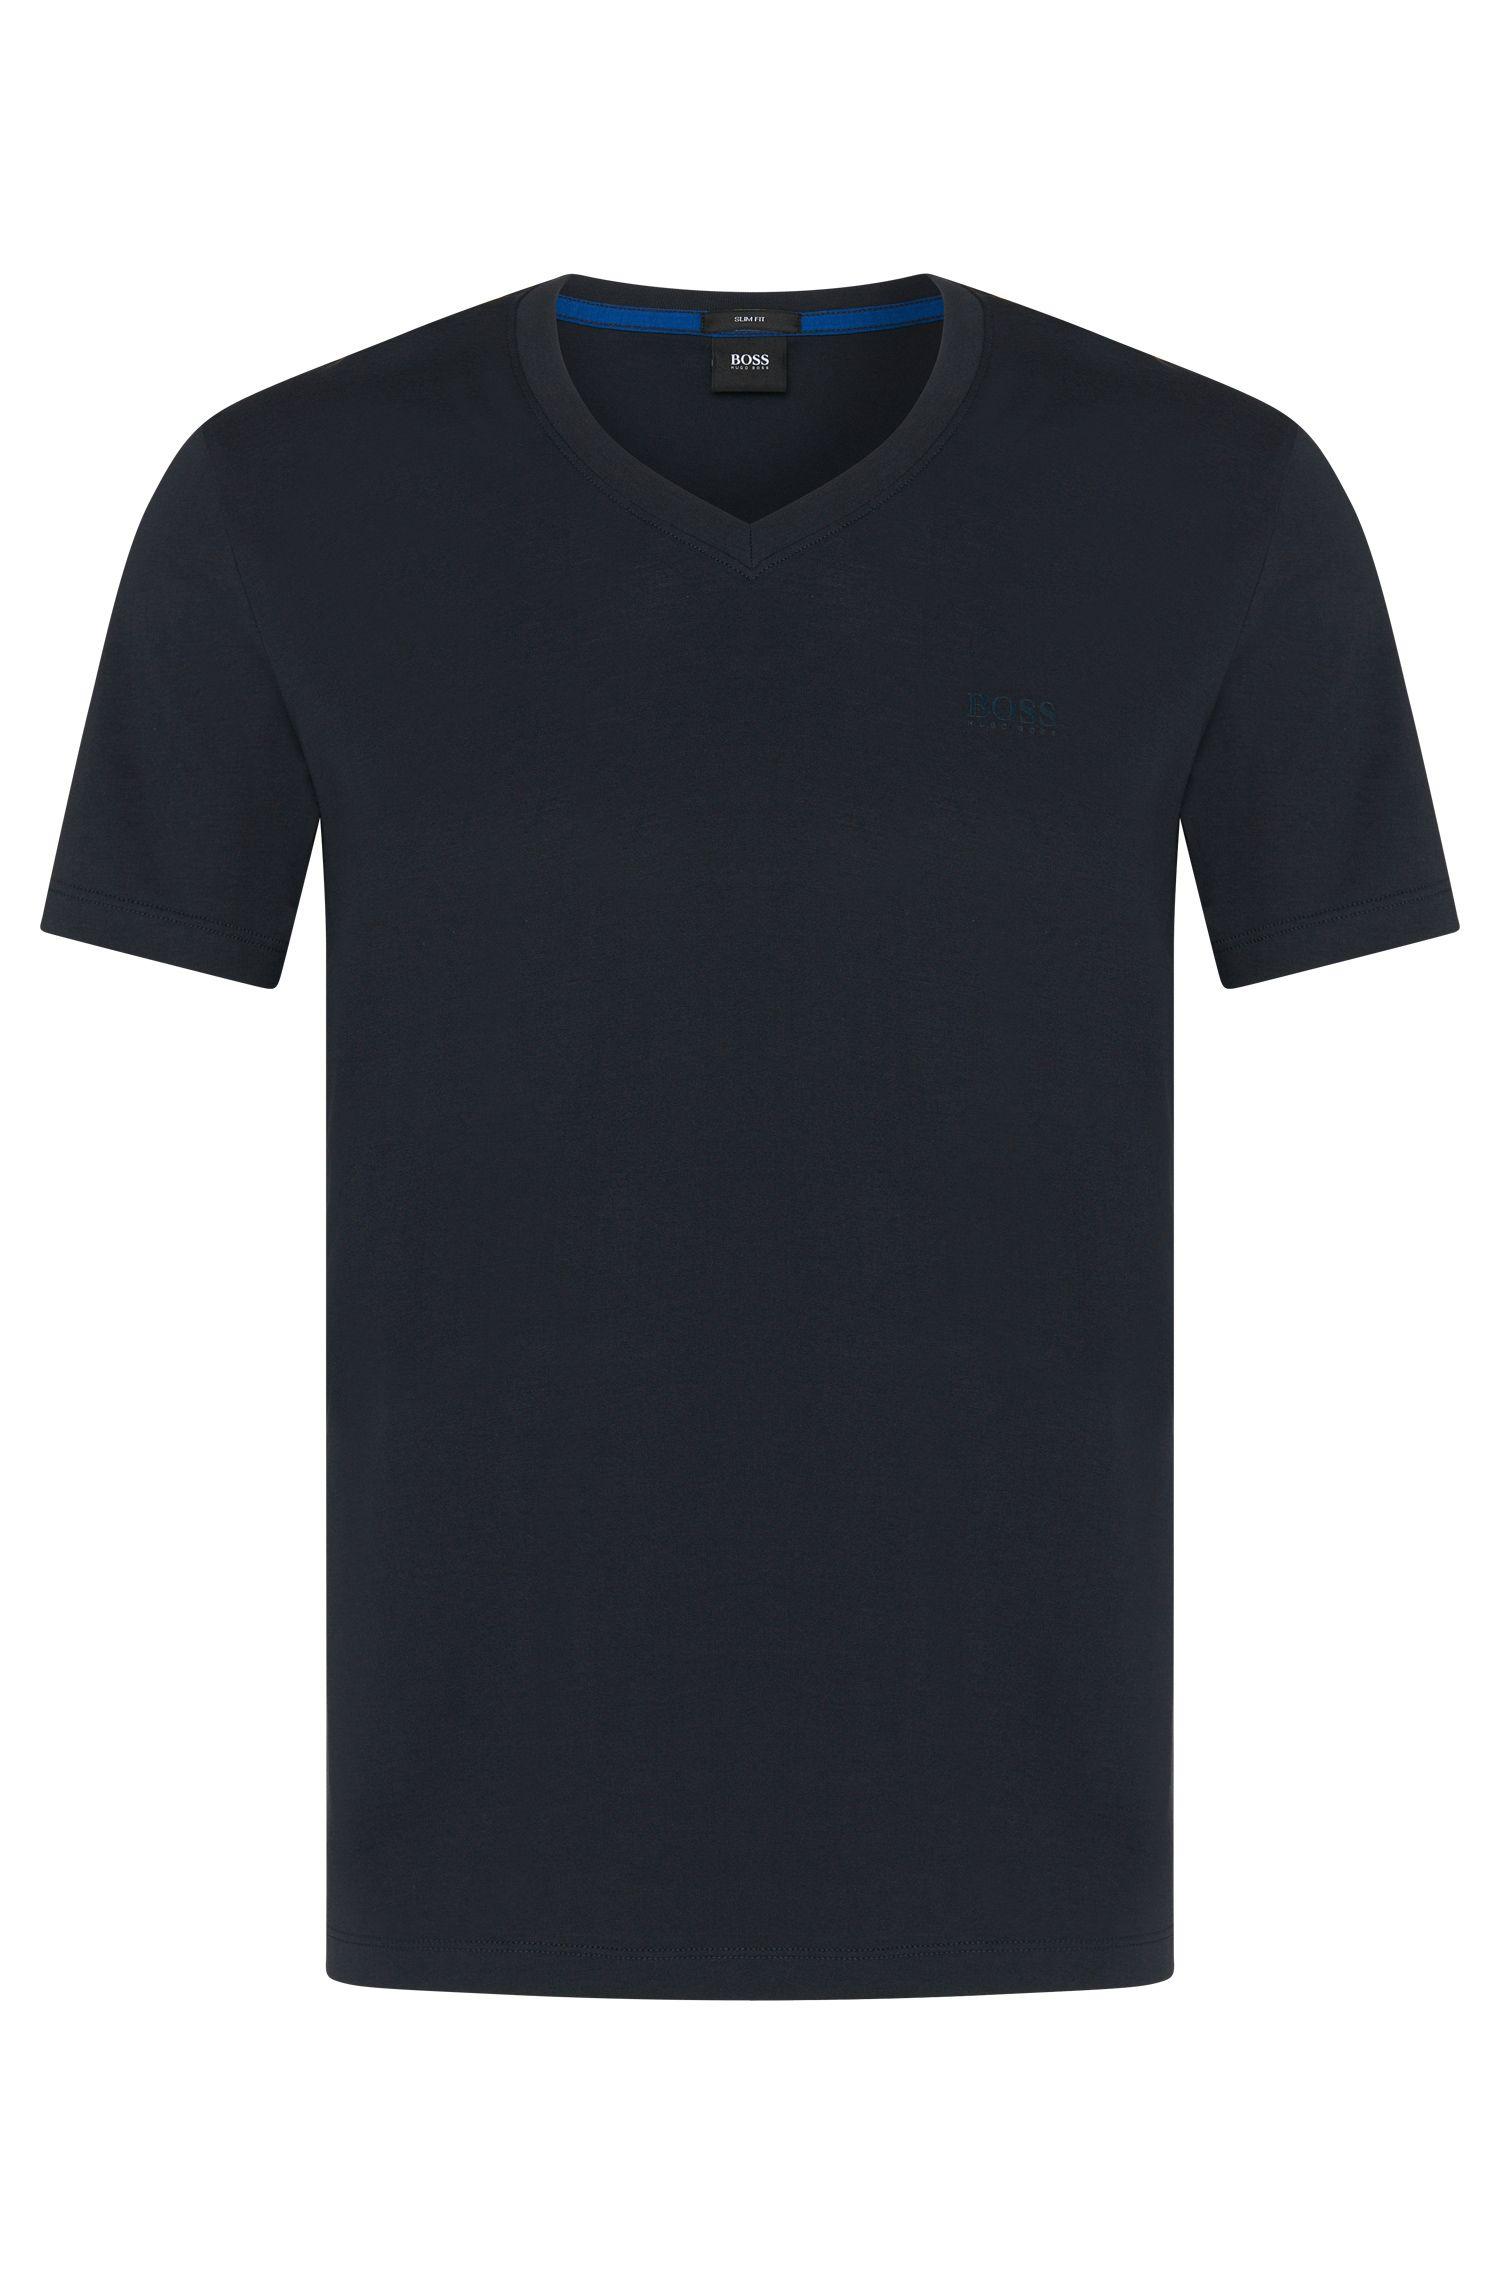 'Teal 11' | Cotton Melange T-Shirt